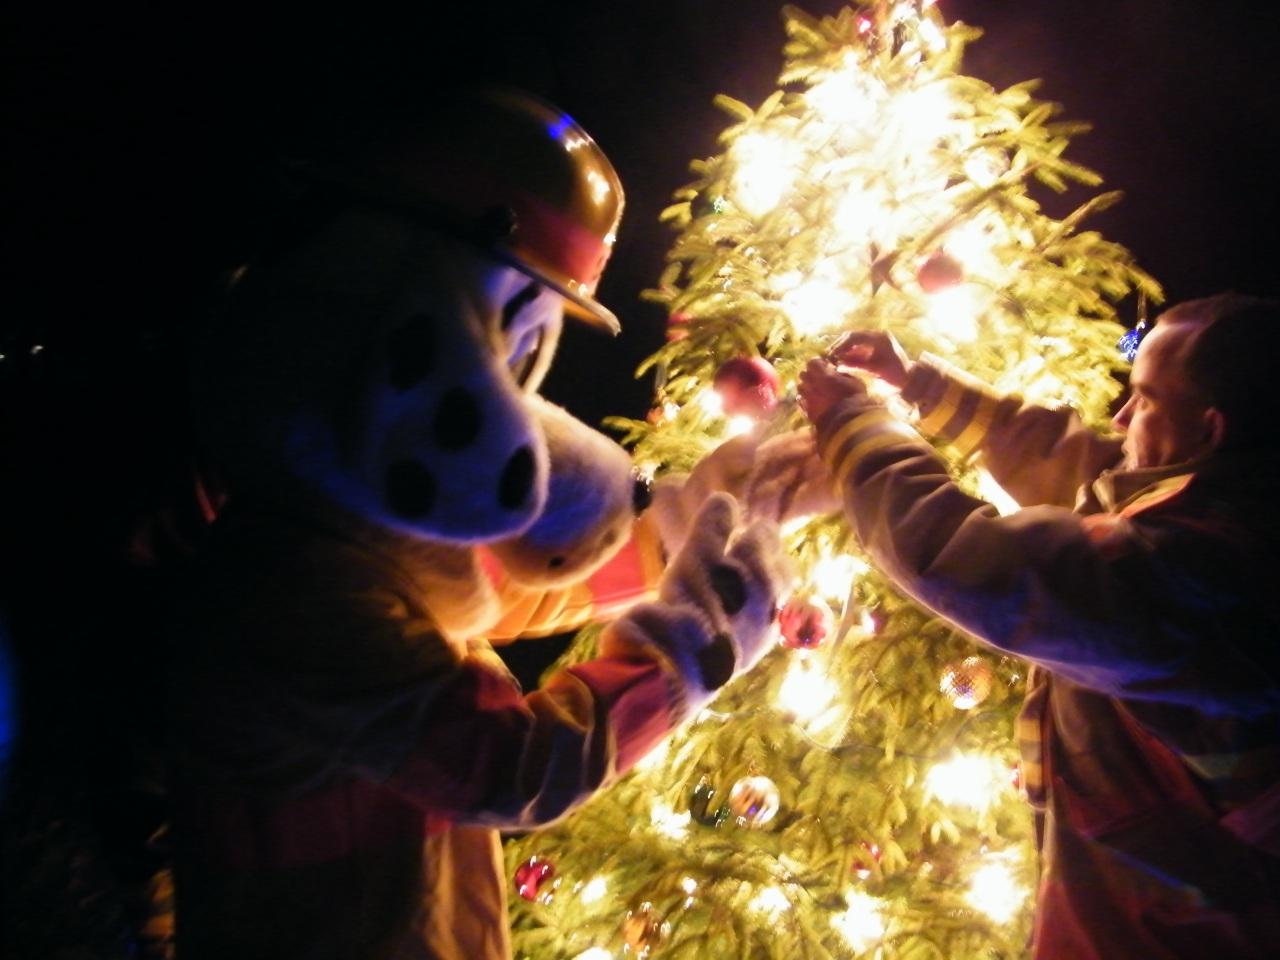 A Community Lights Up a Dark DecemberNight